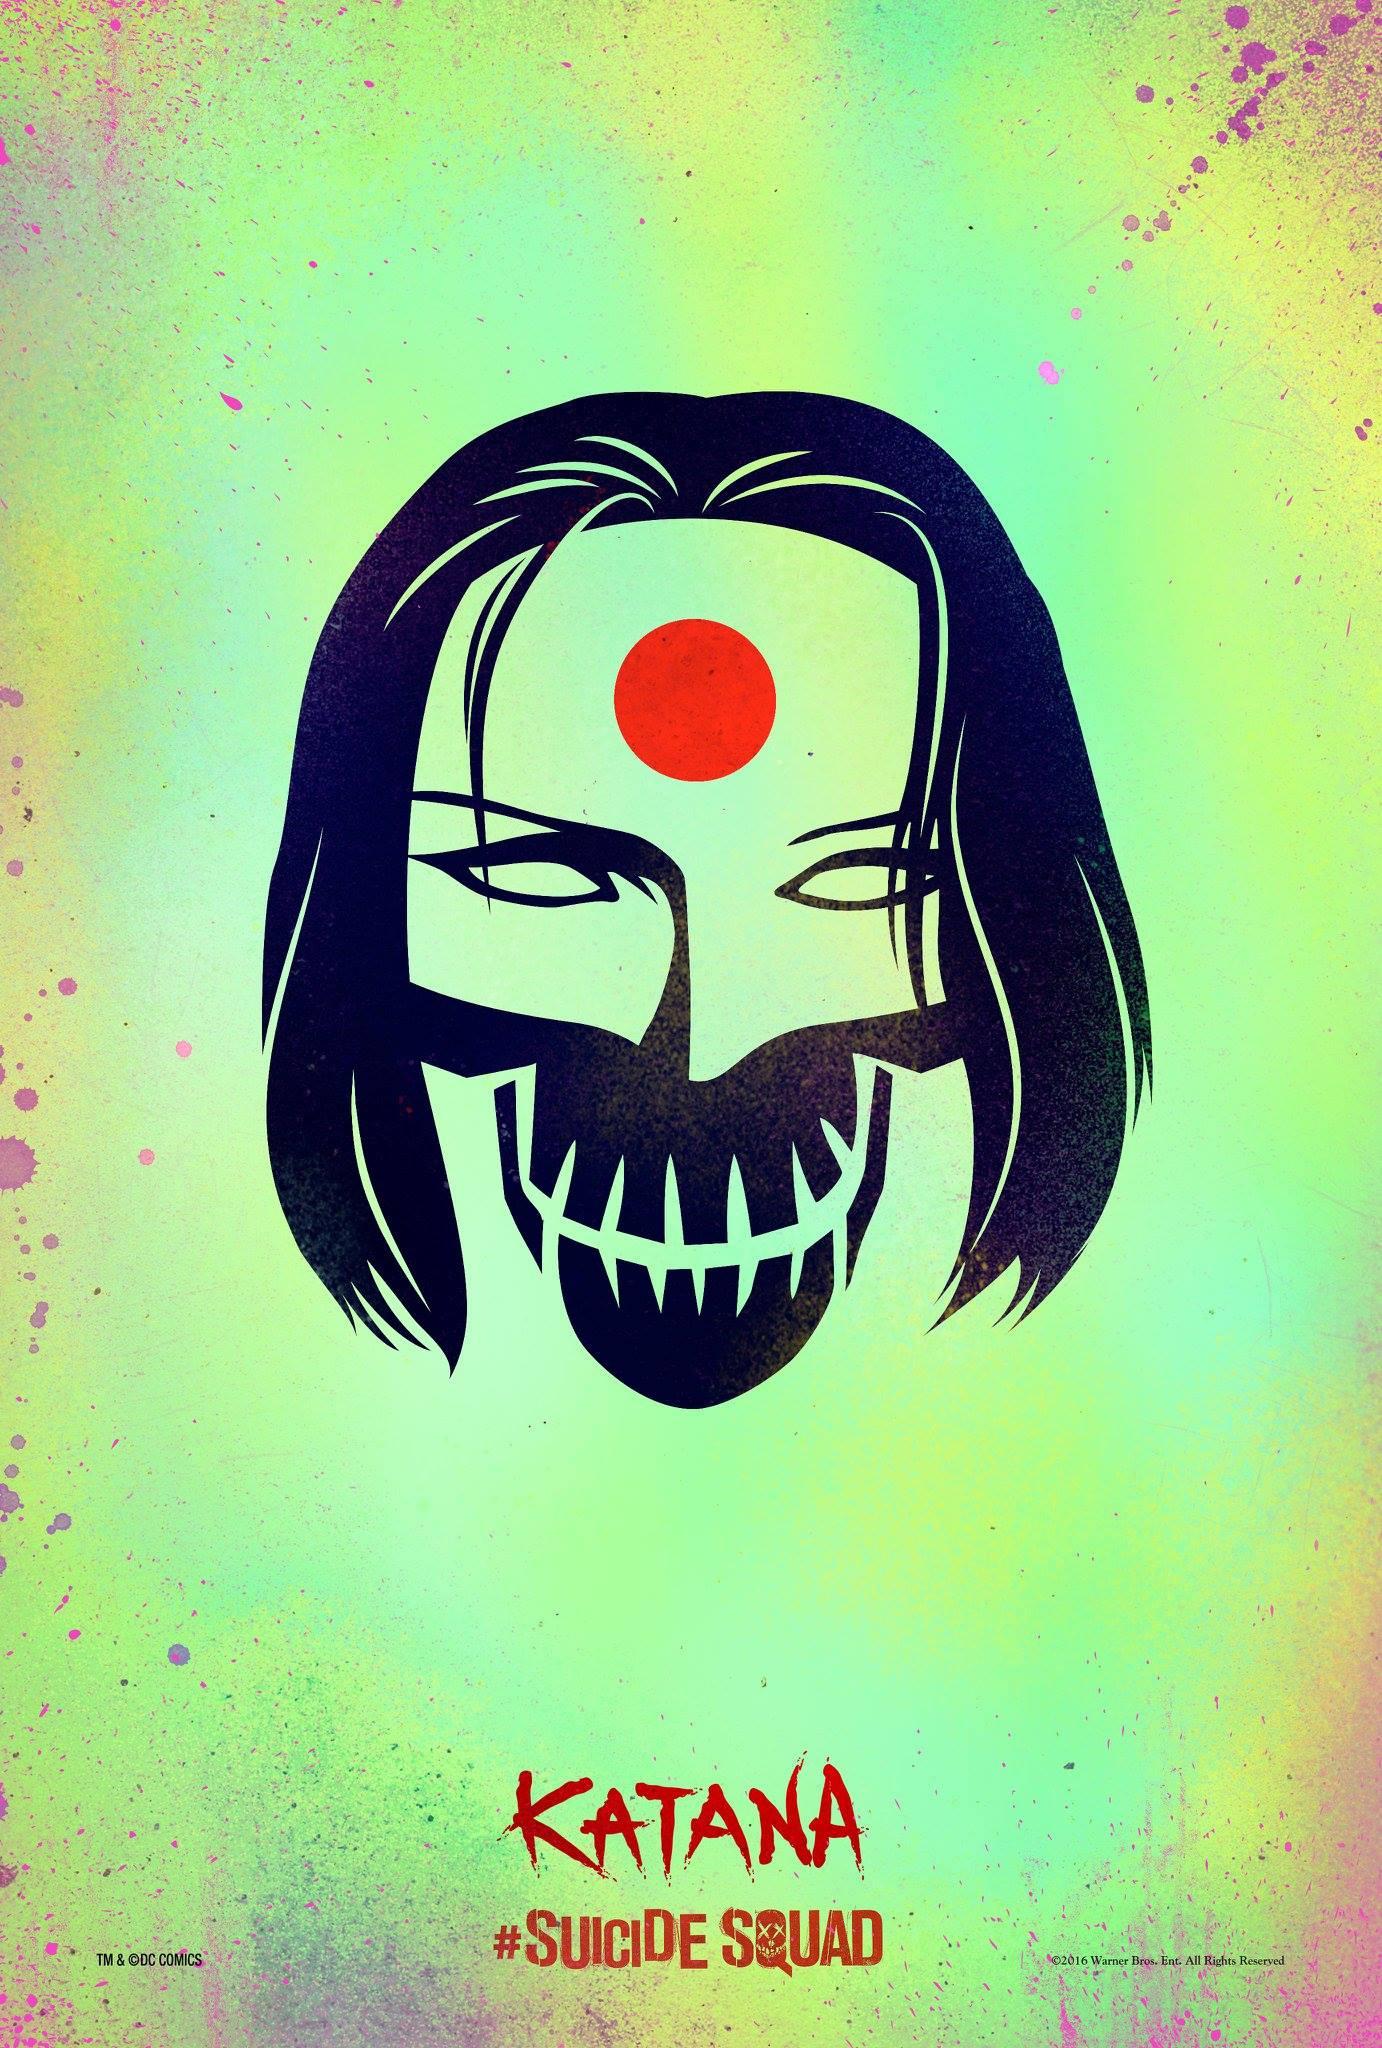 suicide squad movie poster katana - اولین پوسترهای رسمی «جوخه انتحار» منتشر شدند